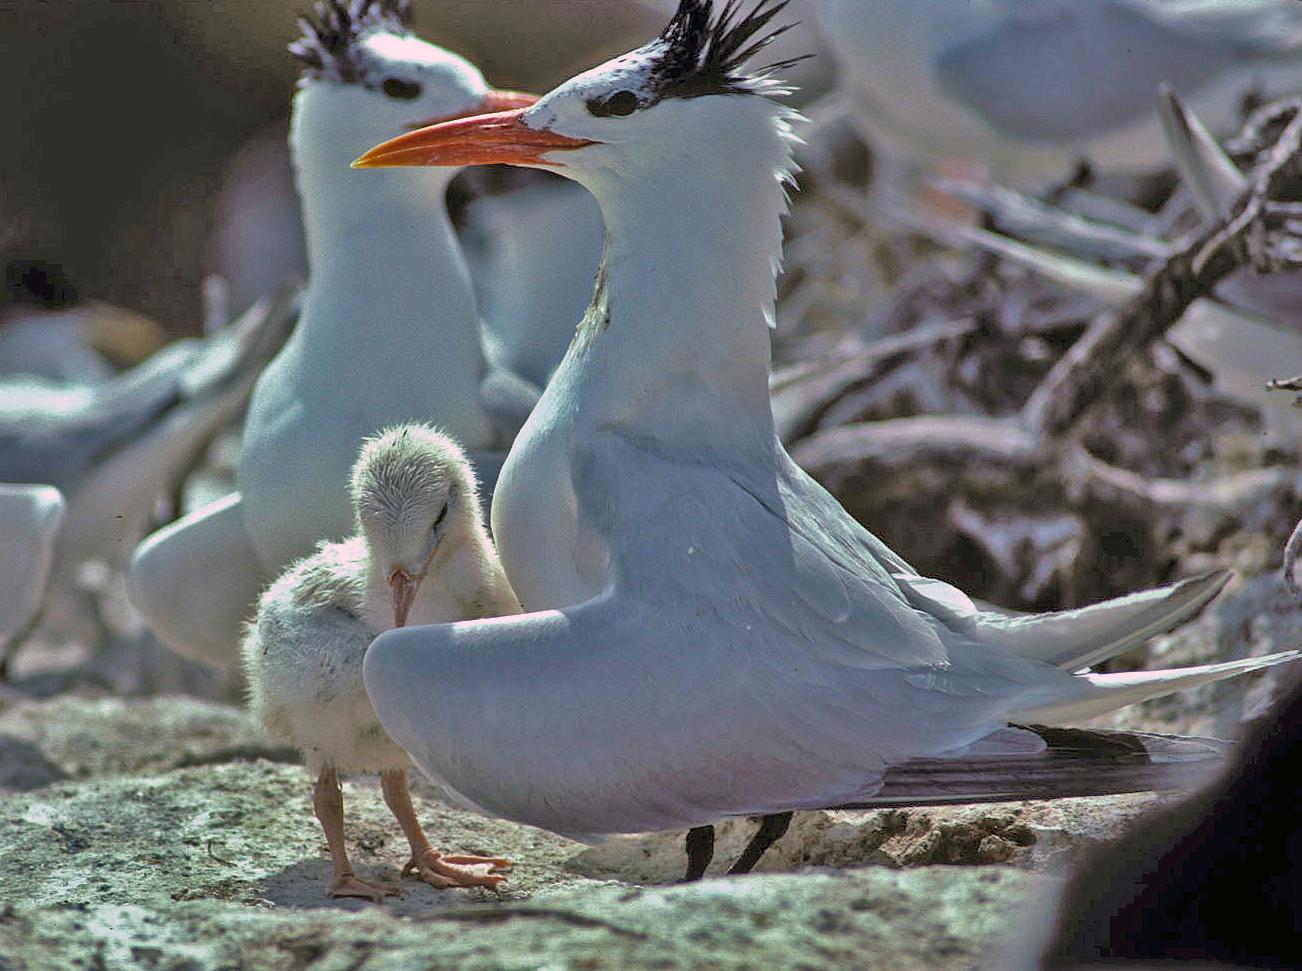 Magnificent Royal Terns